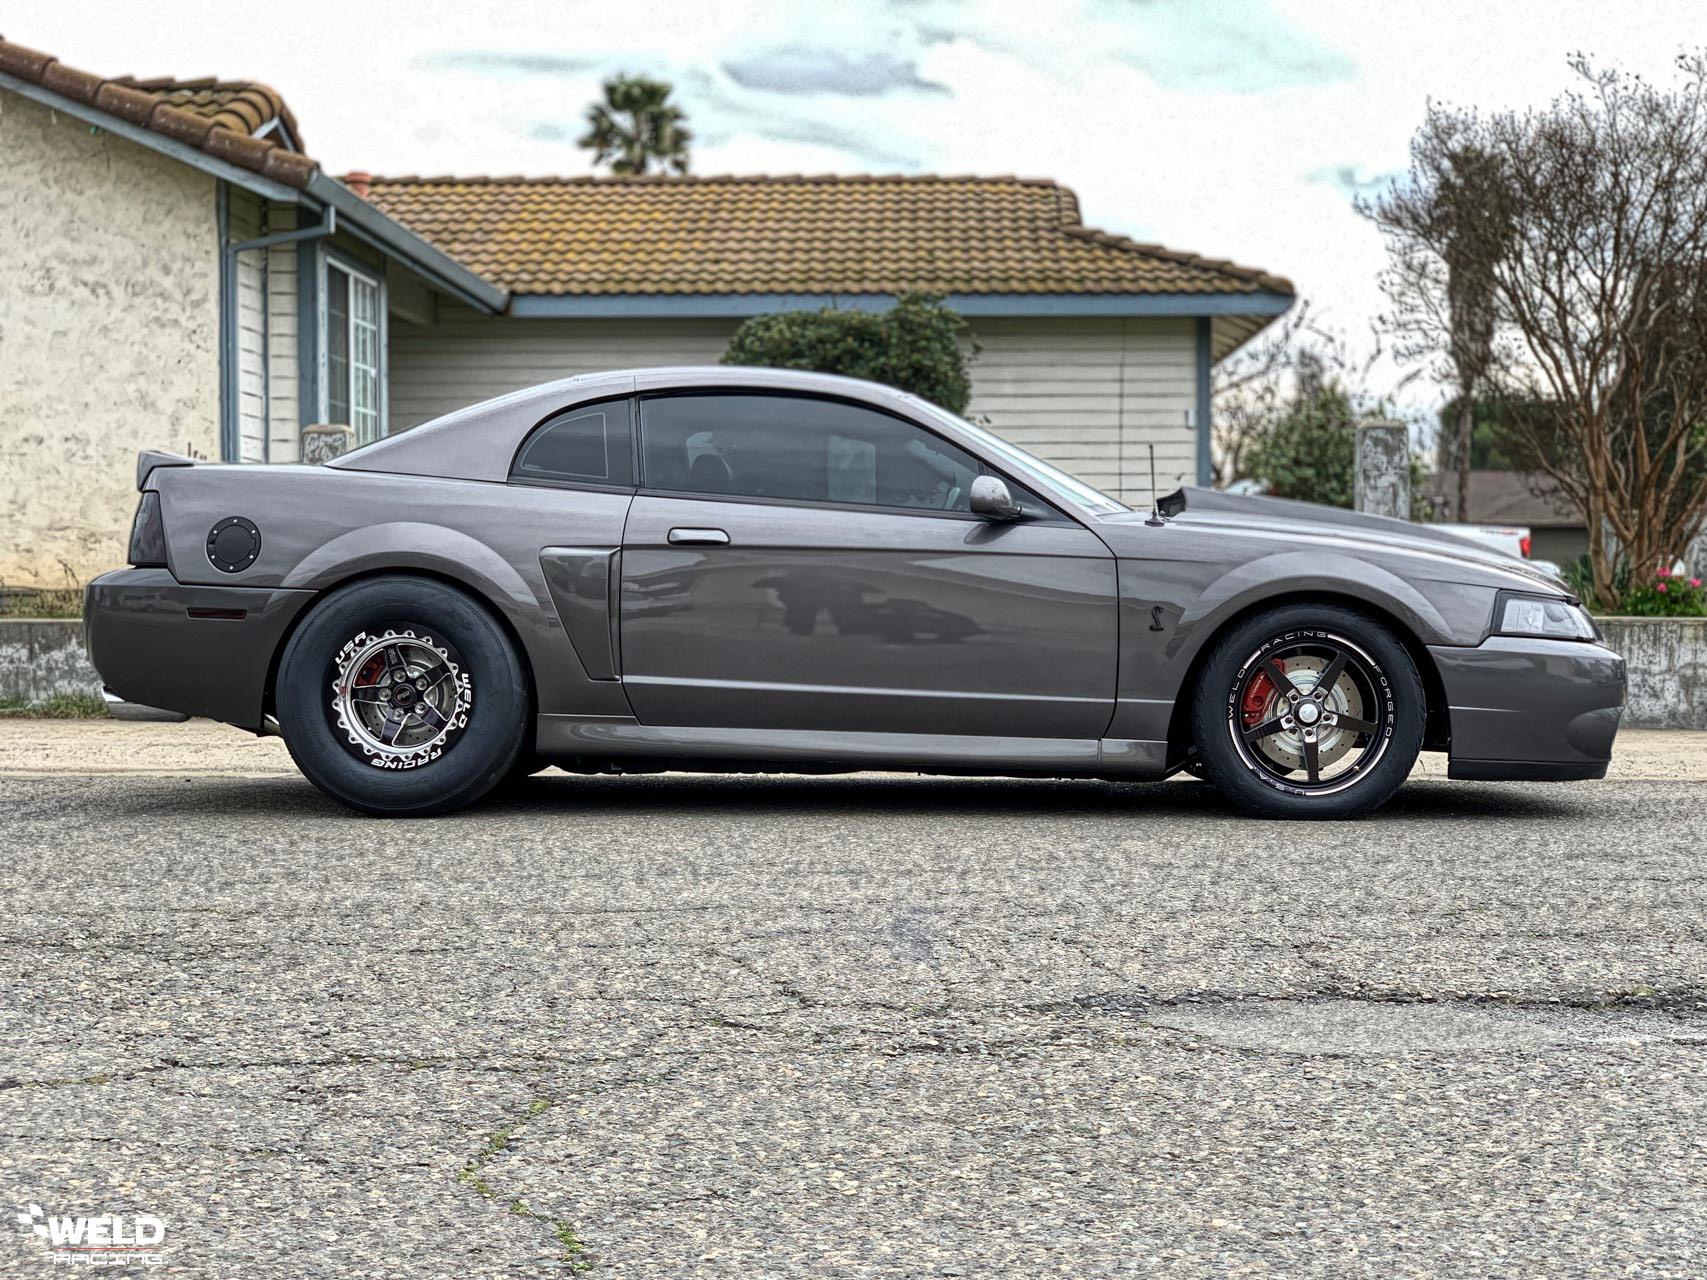 Matte Black Ford Mustang 2003 Cobra Terminator - Weld S71 Wheels